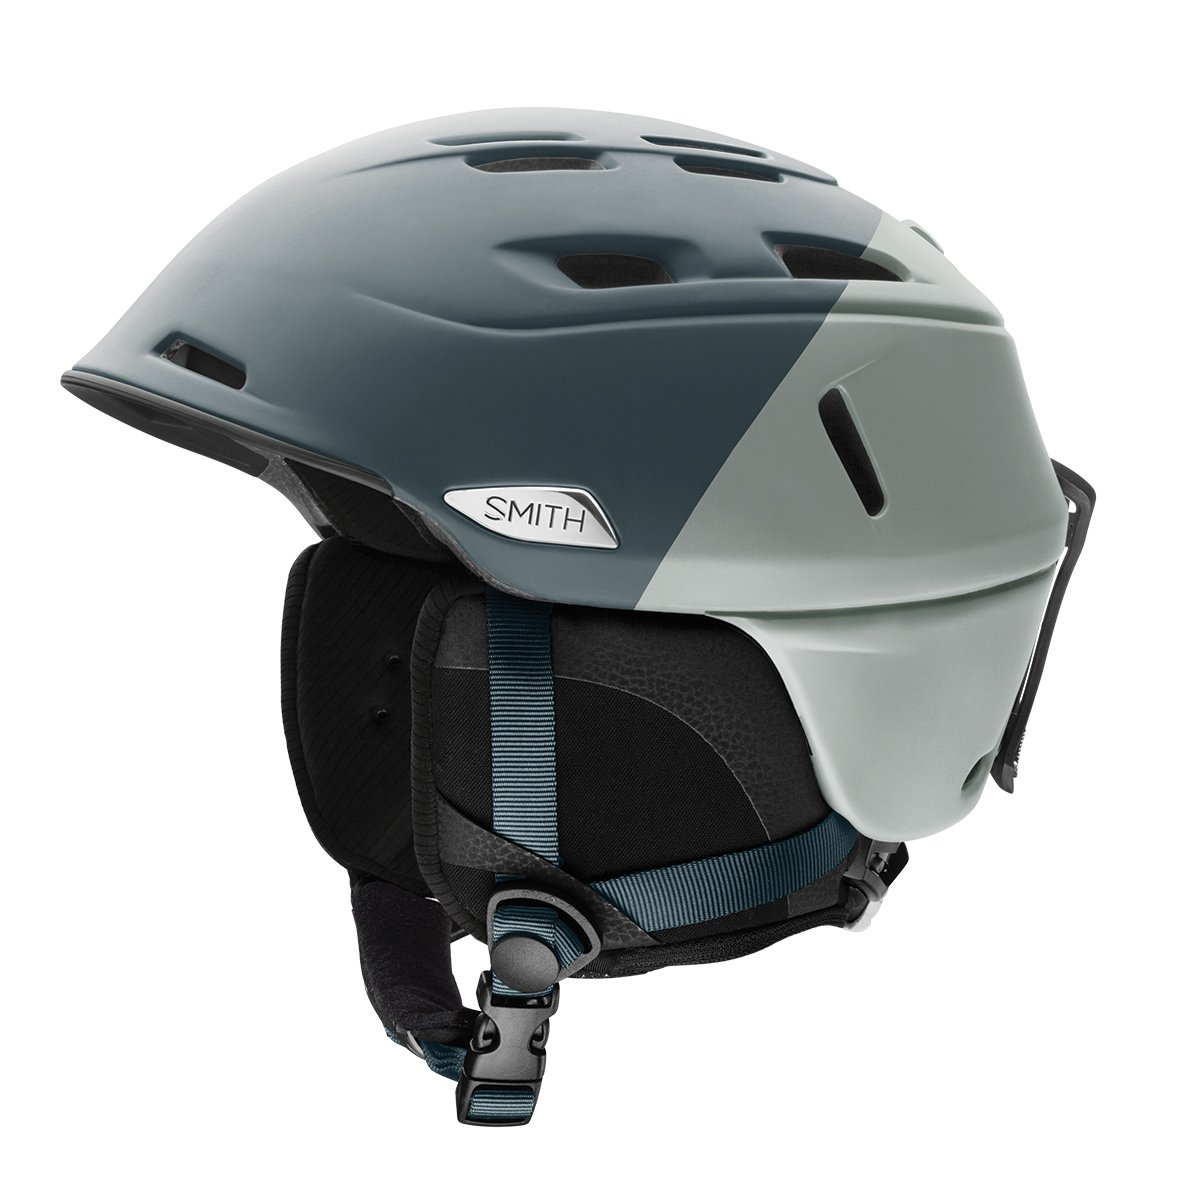 Smith Optics Adult Camber Ski Snowmobile Helmet - Matte Thunder Gray Split / Large by Smith Optics